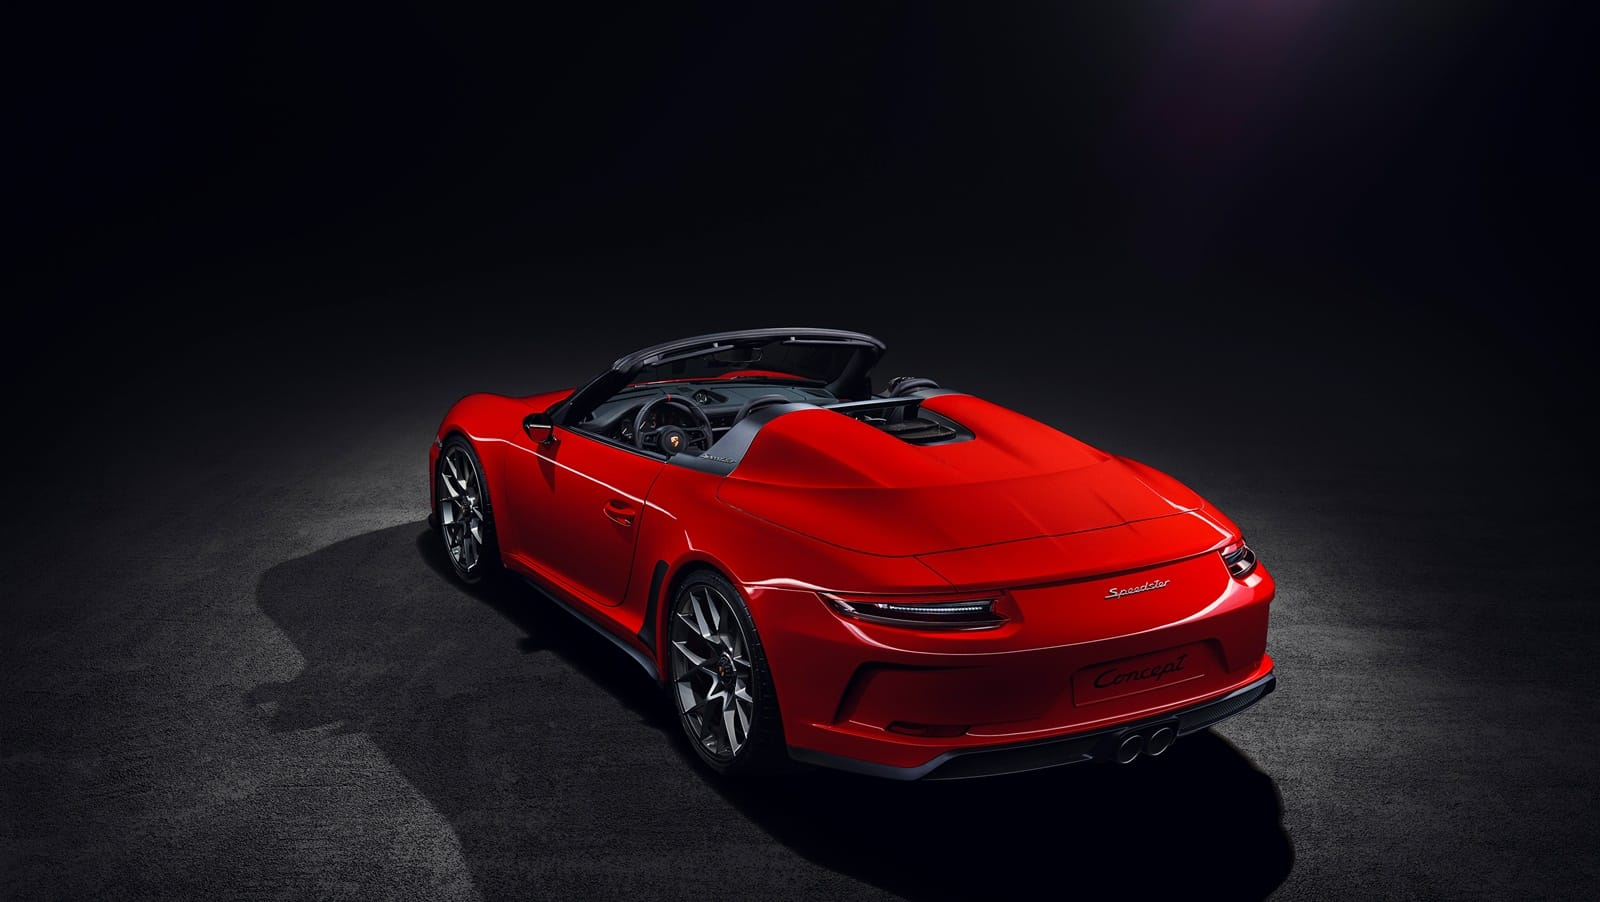 el porsche 911 speedster llegar a producci n en 2019. Black Bedroom Furniture Sets. Home Design Ideas